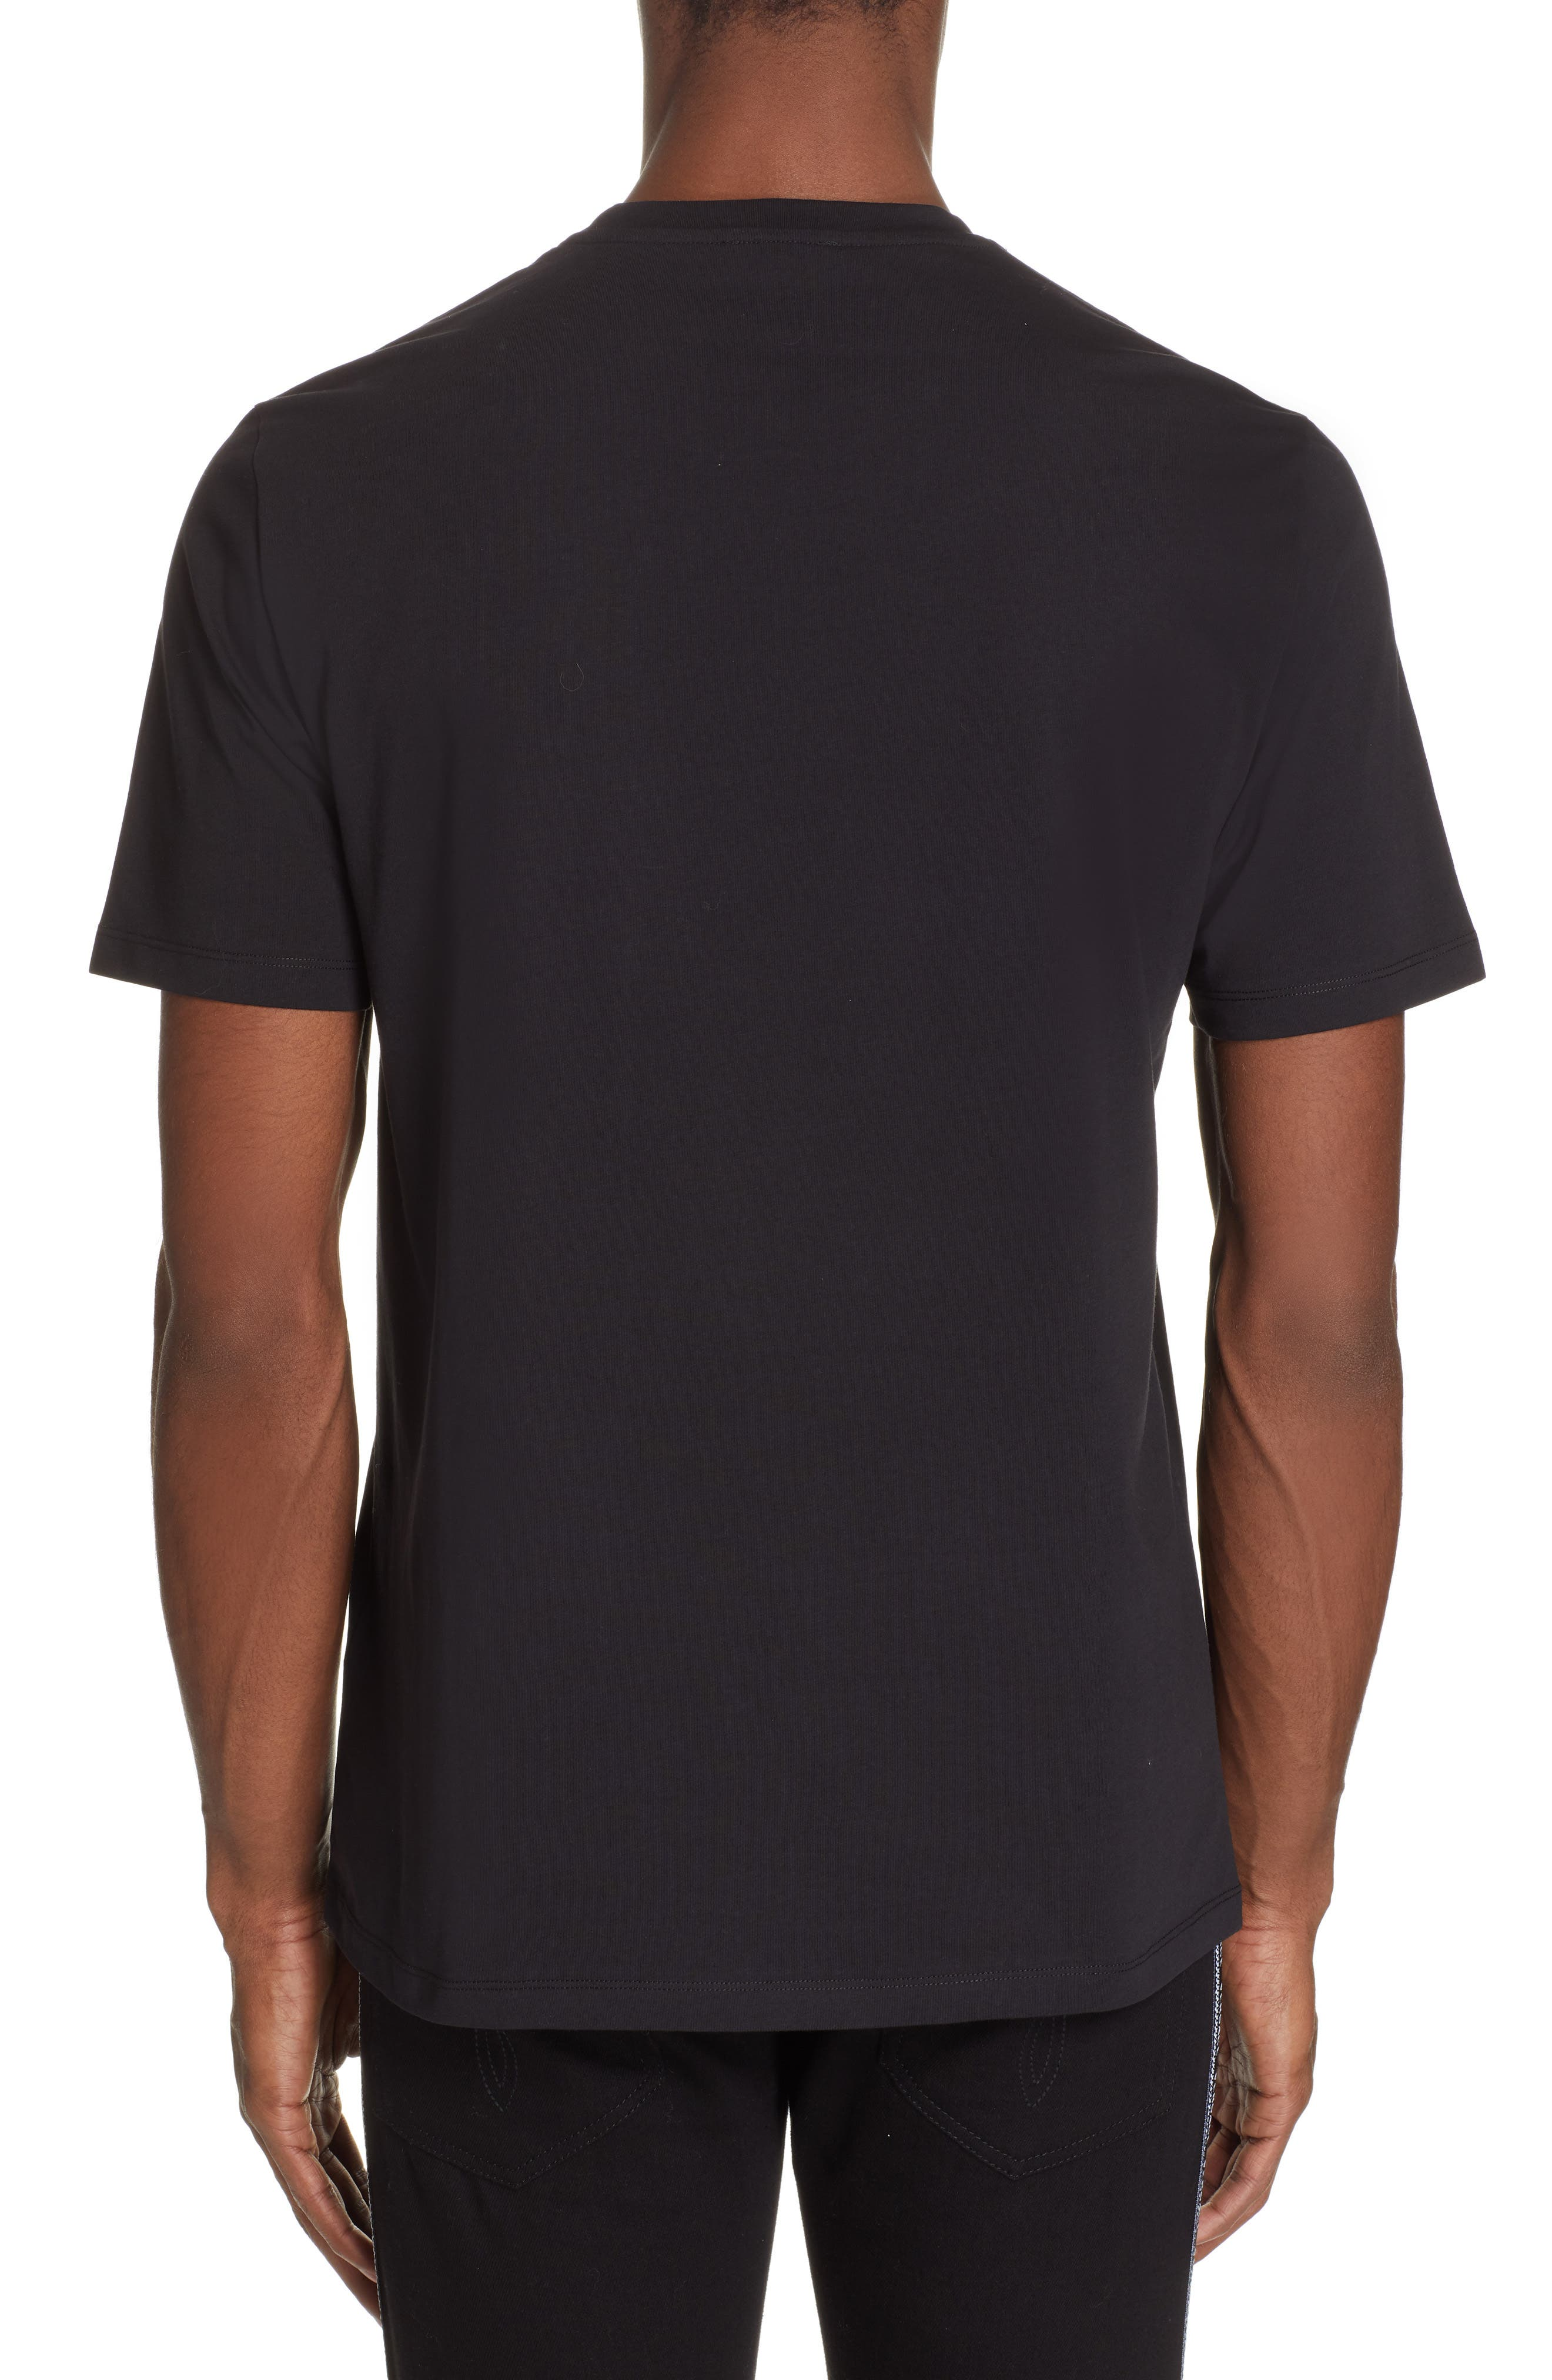 VERSACE COLLECTION,                             Half Medusa T-Shirt,                             Alternate thumbnail 2, color,                             BLACK